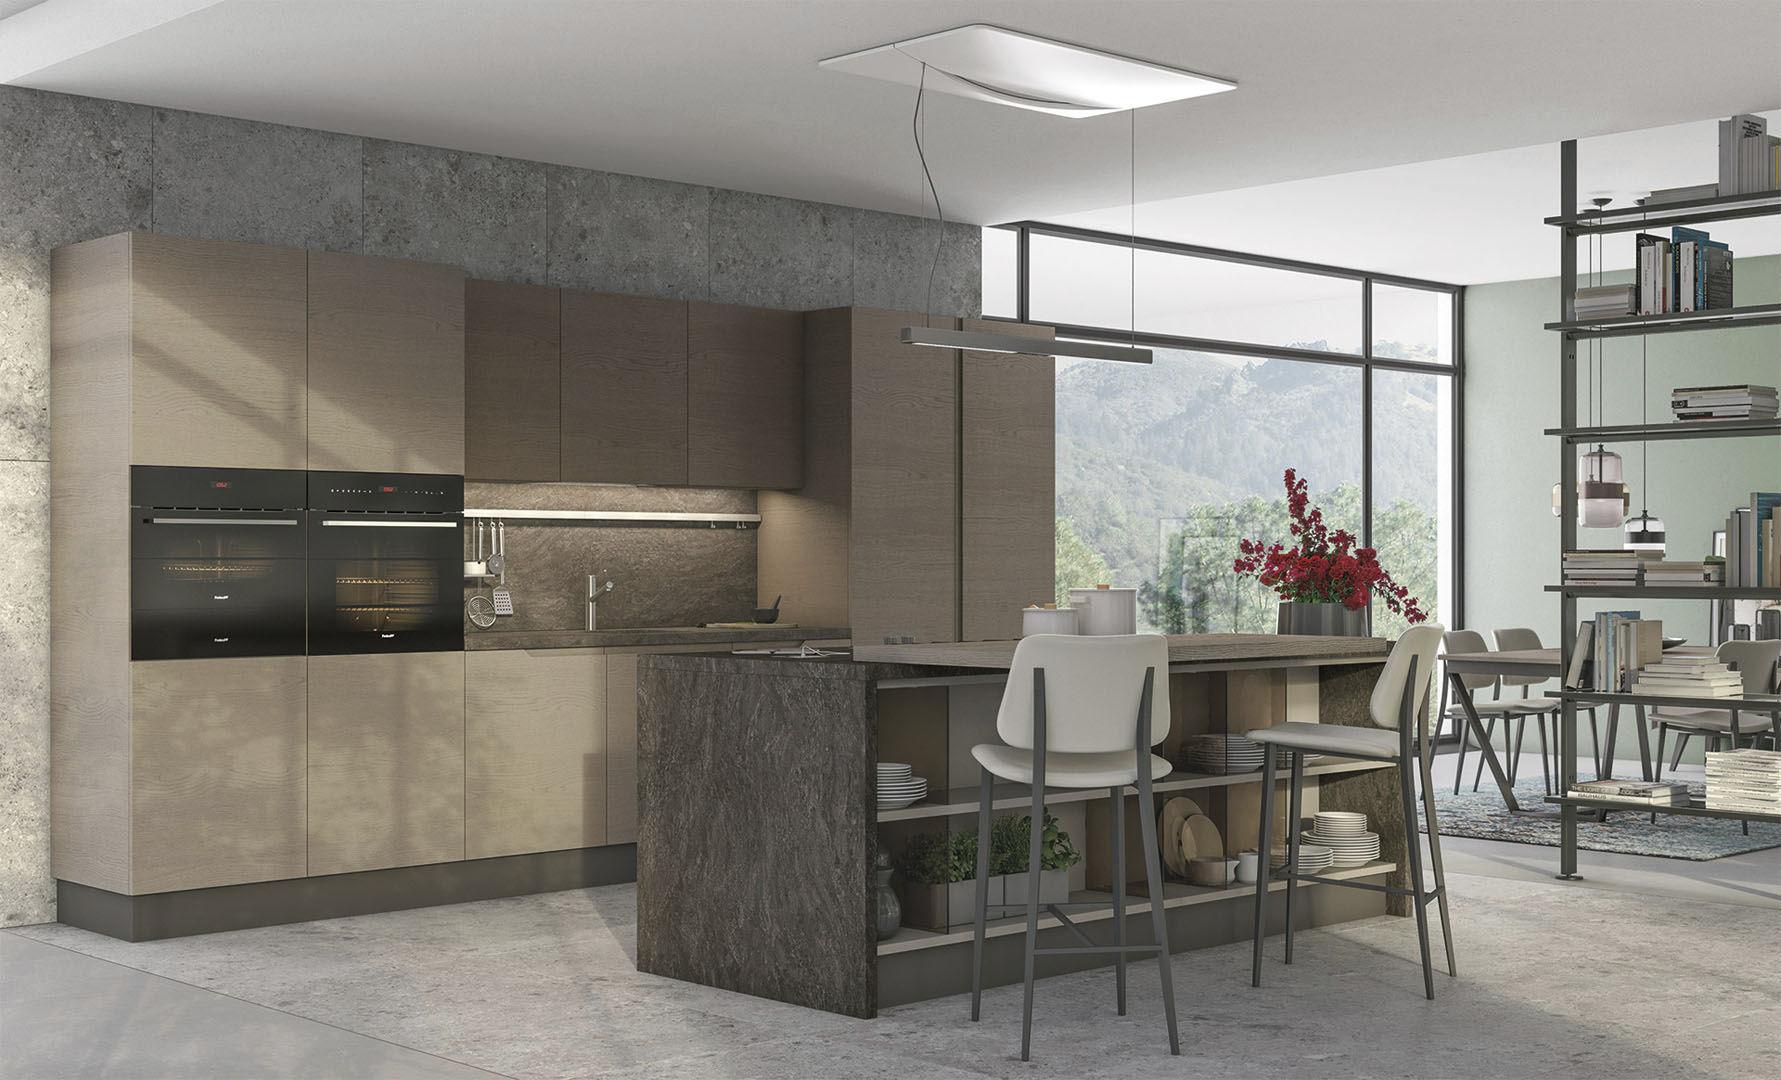 Moderne Küche / Holz / Kochinsel / lackiert LUNA CUCINE LUBE